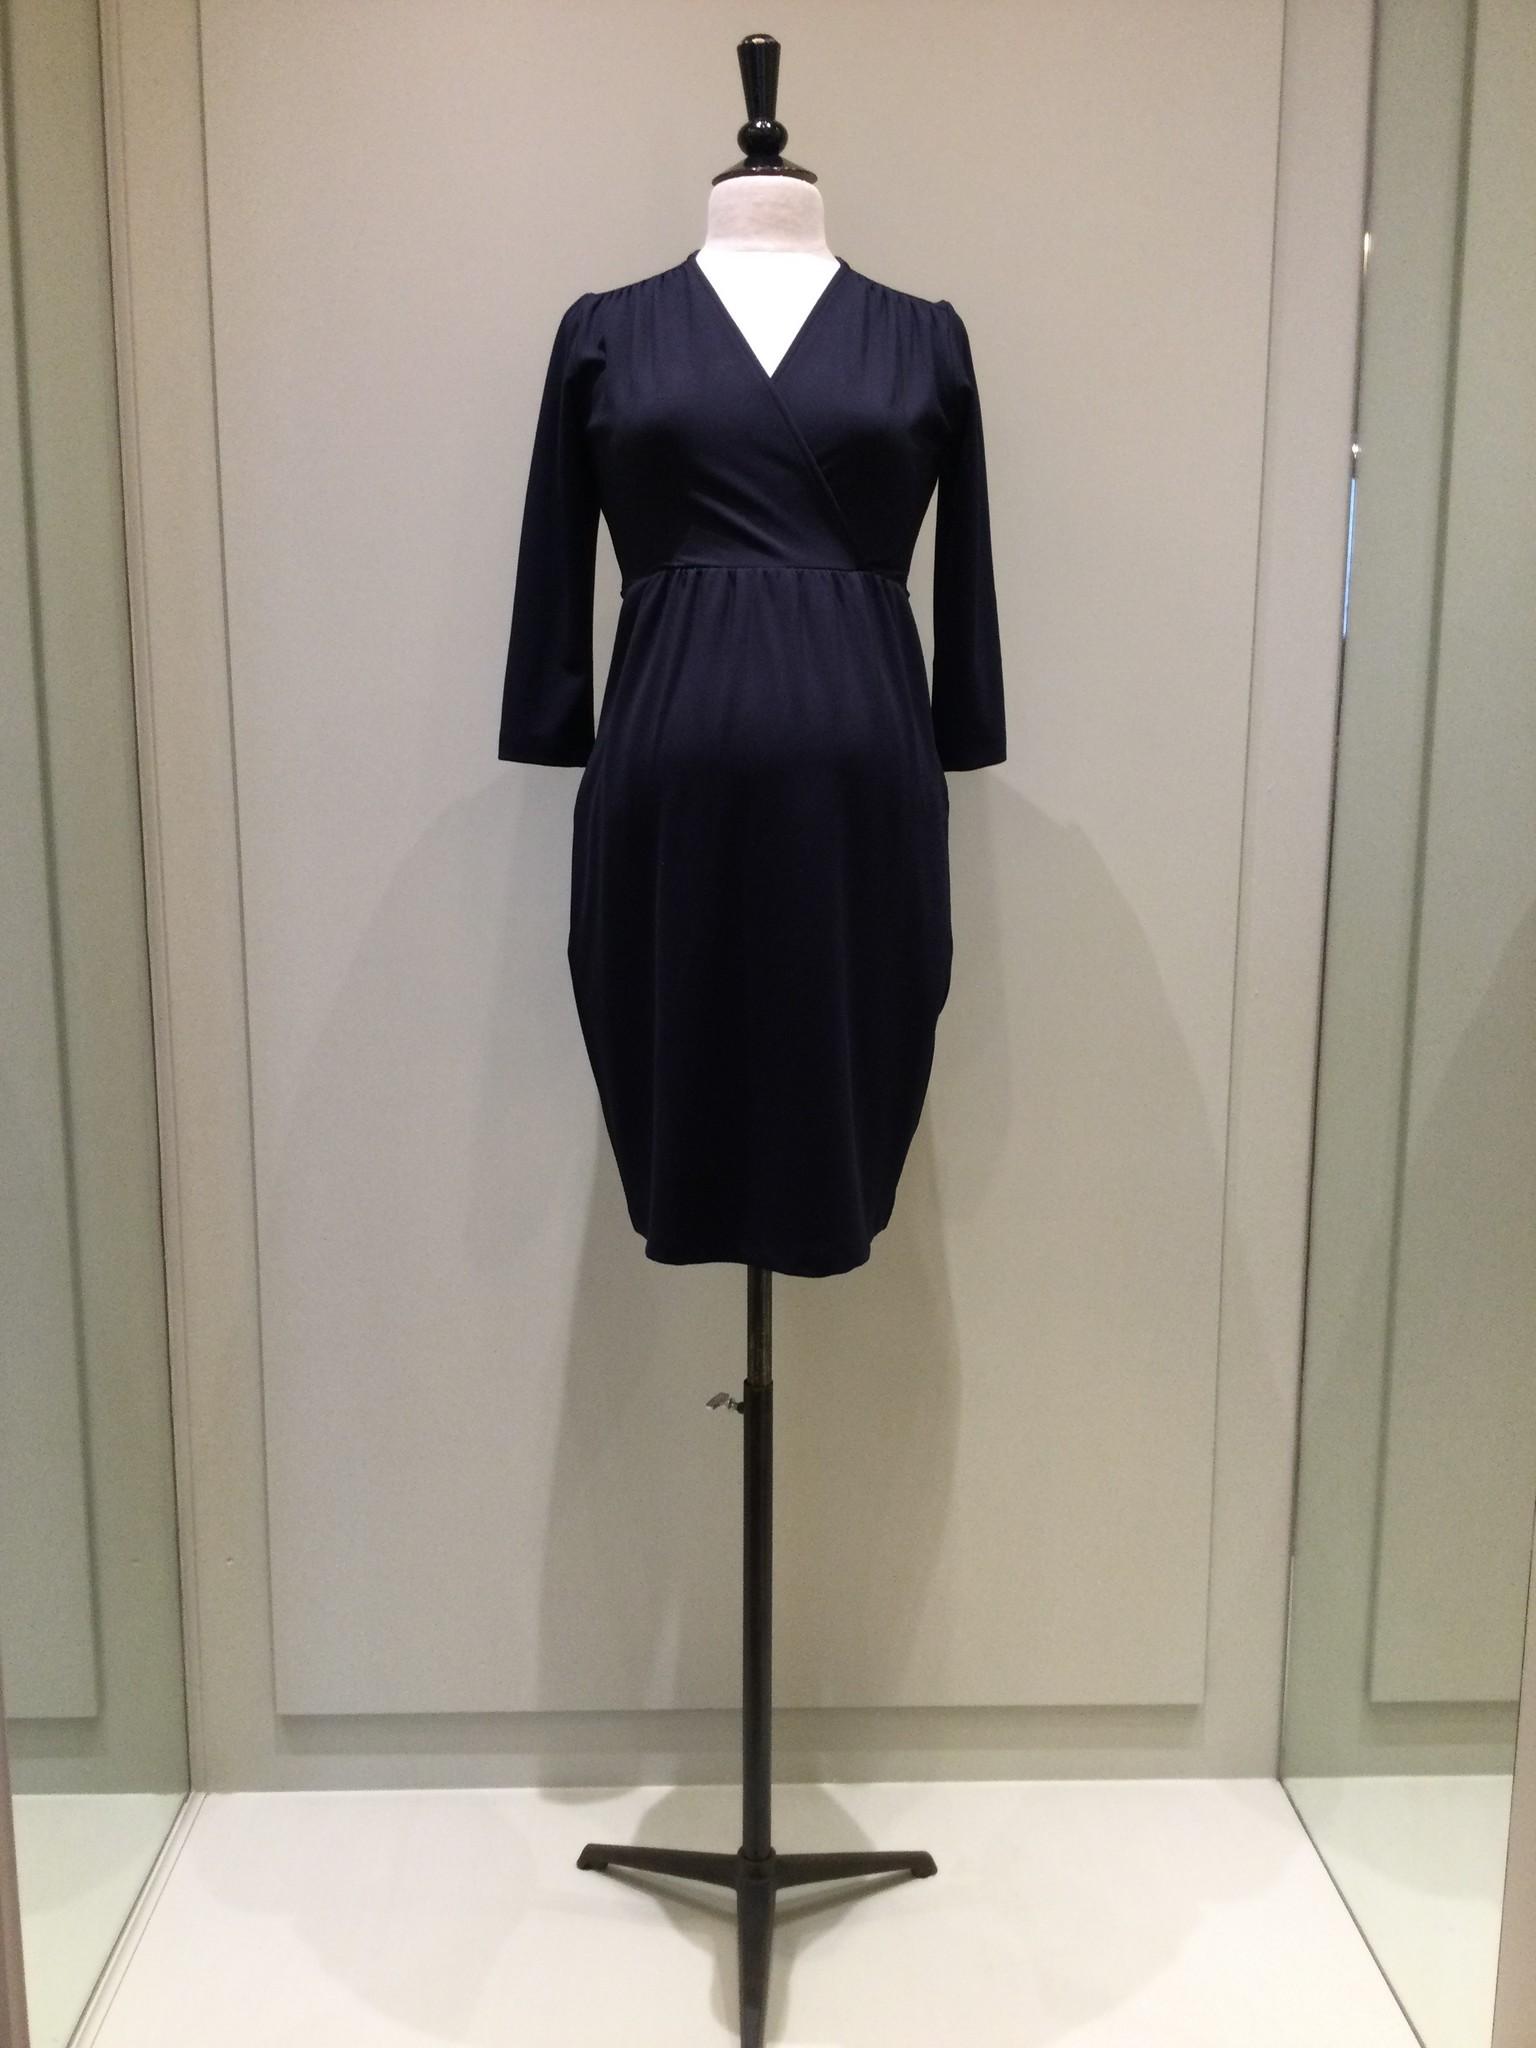 Comfy dress 7/8 sleeves - navy-1